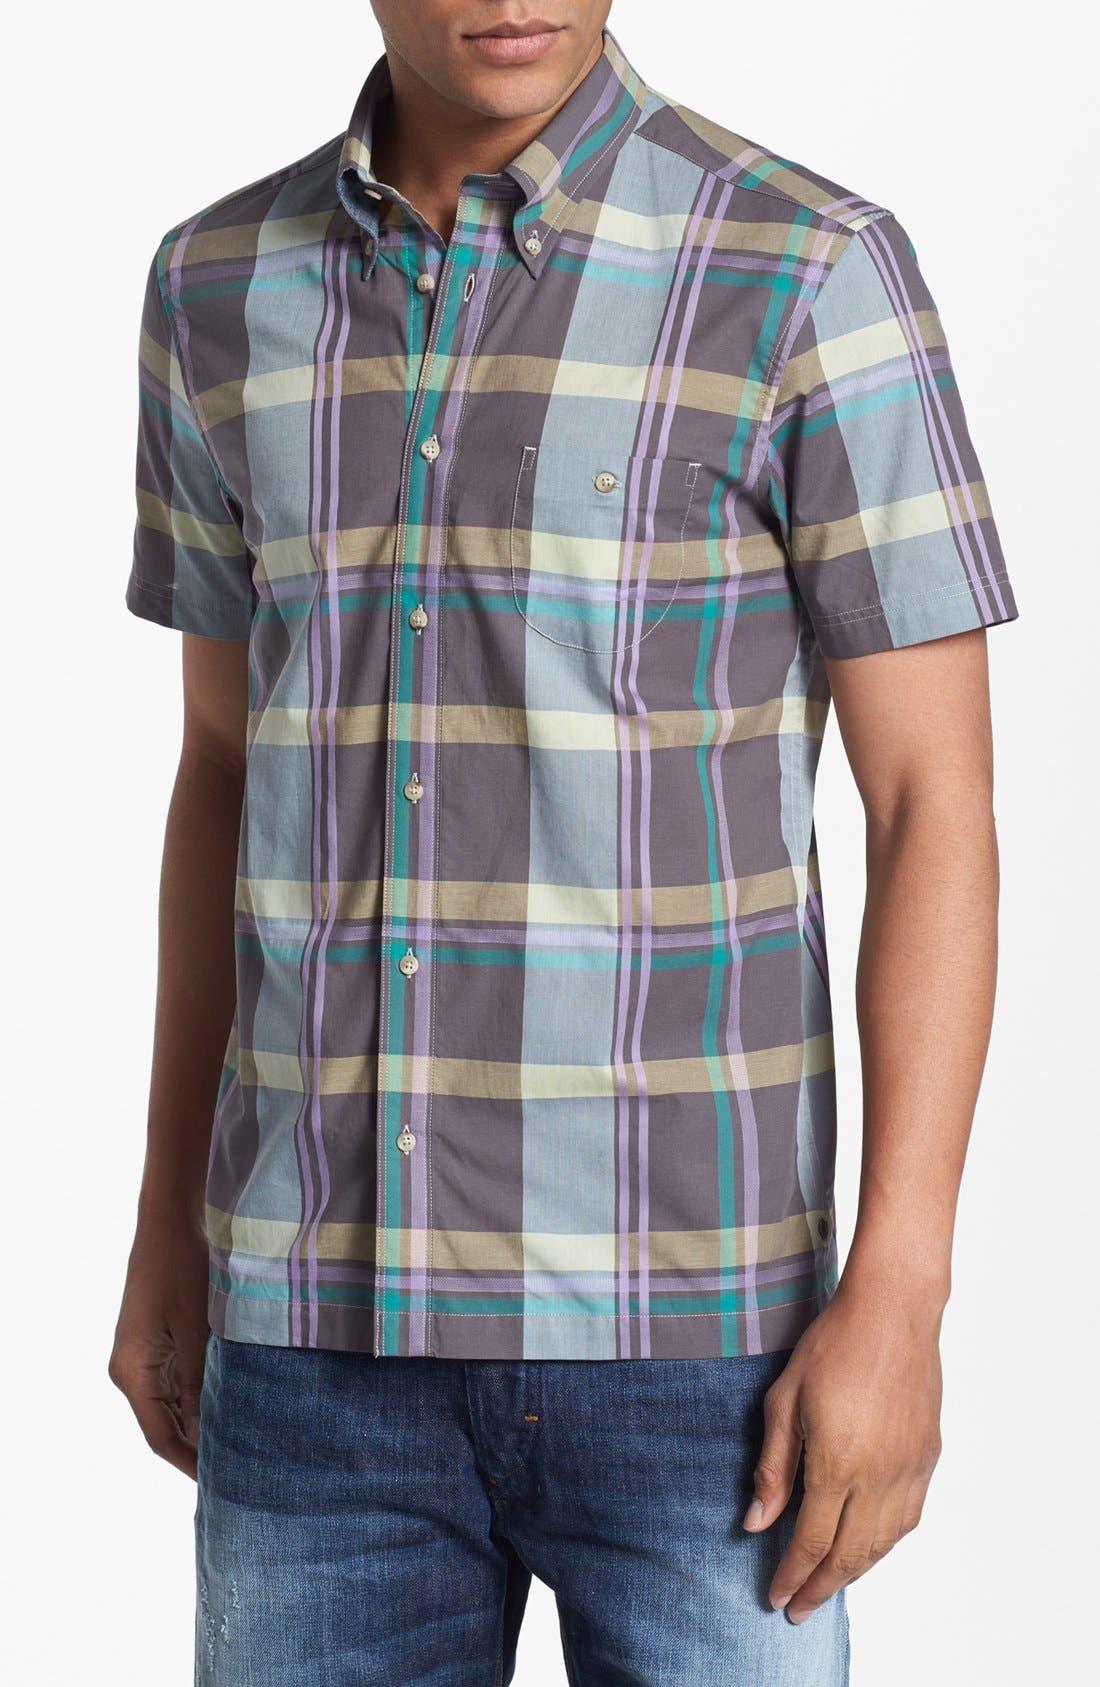 Alternate Image 1 Selected - Ben Sherman Plaid Short Sleeve Woven Shirt